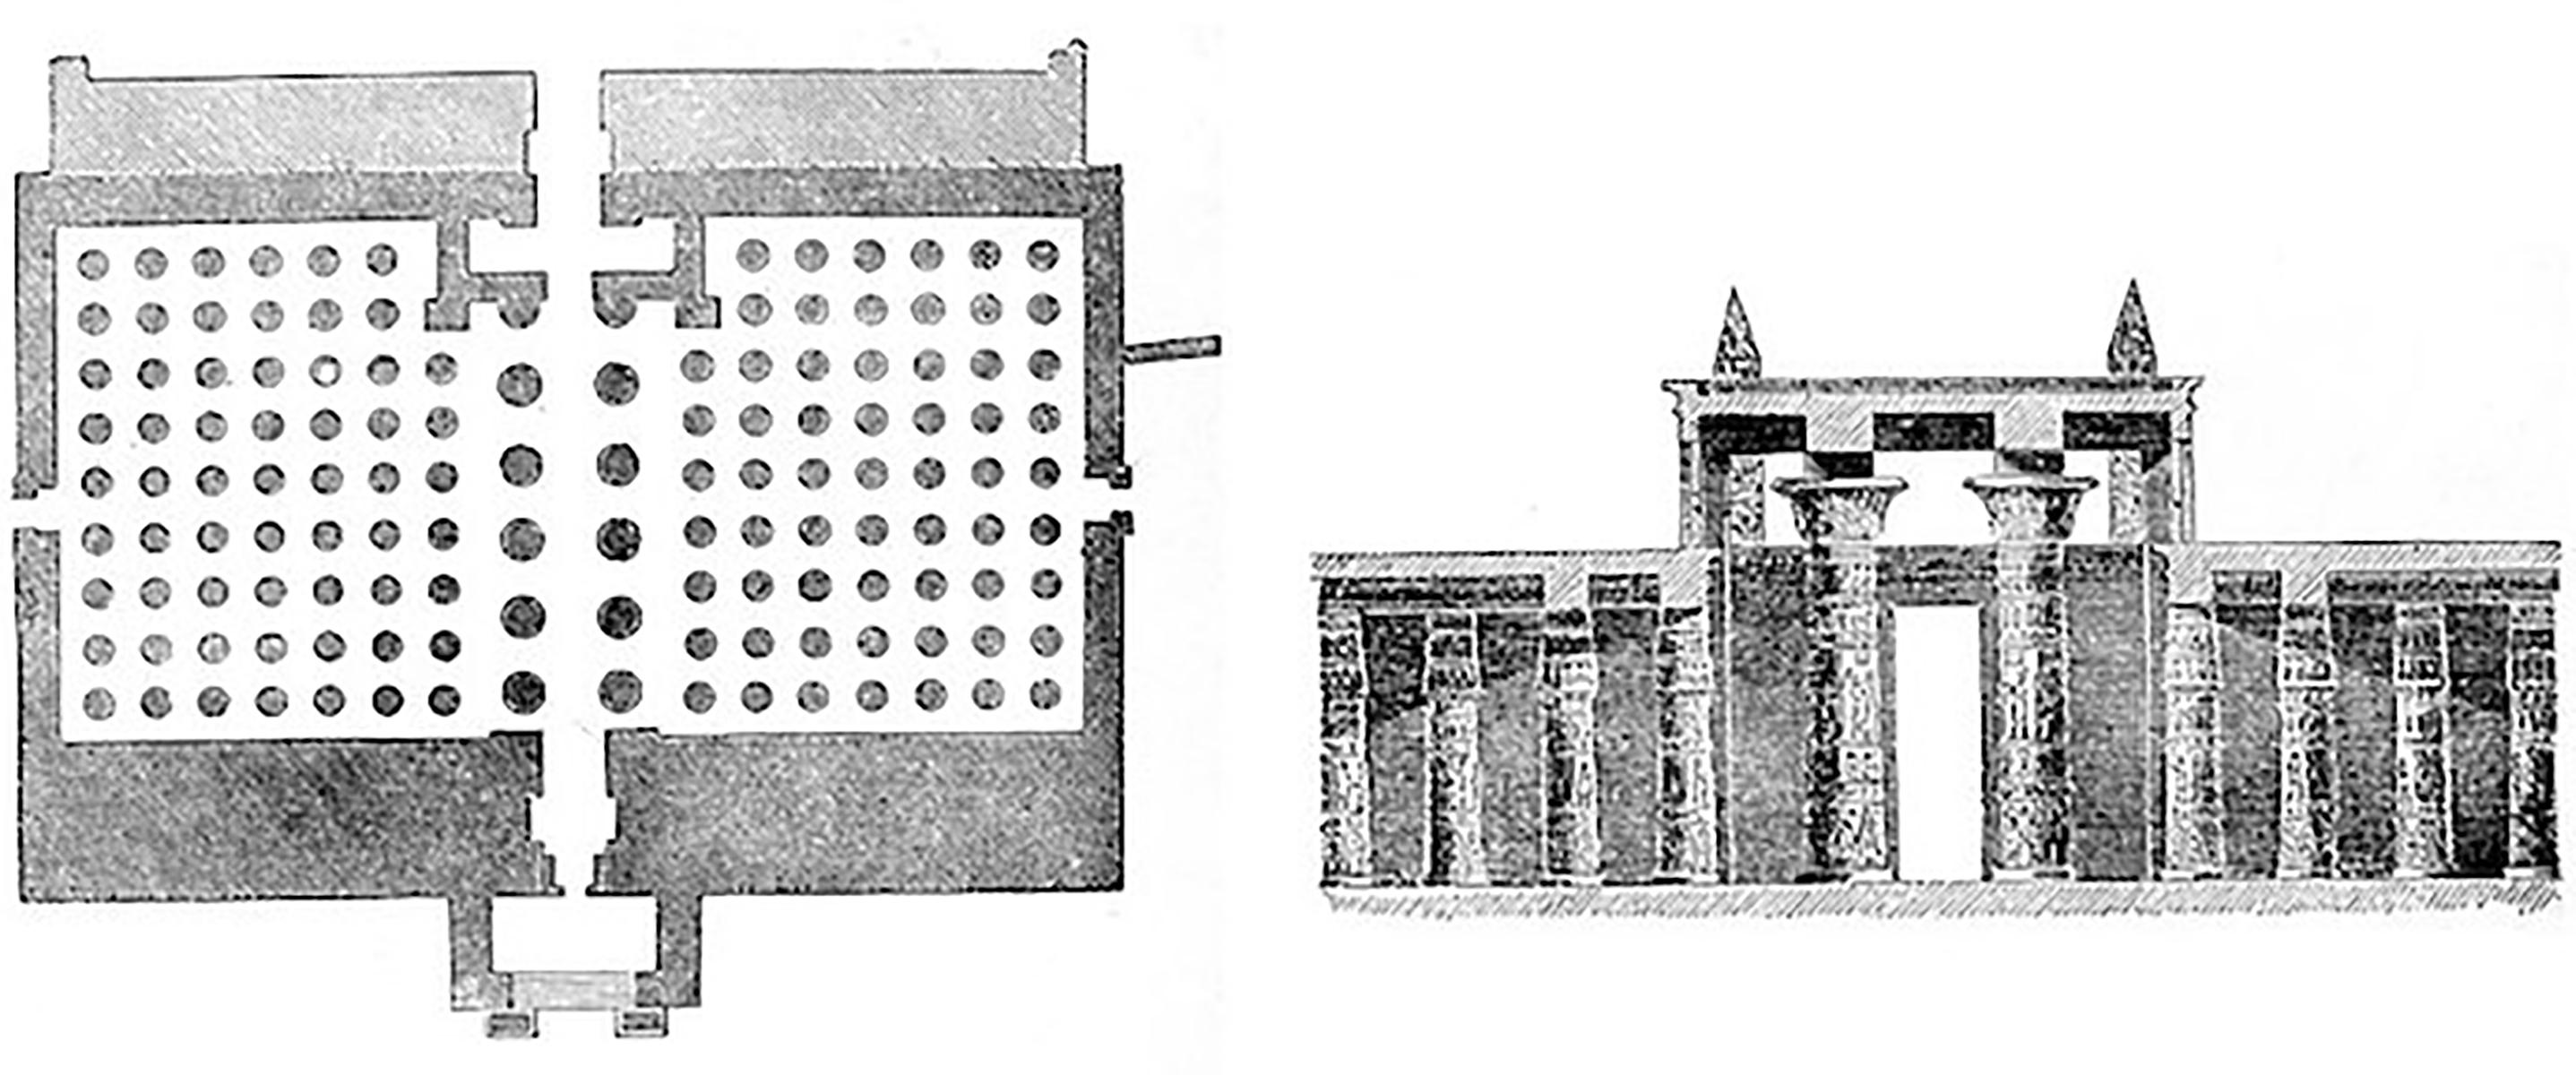 Hypostyle Hall at Karnak